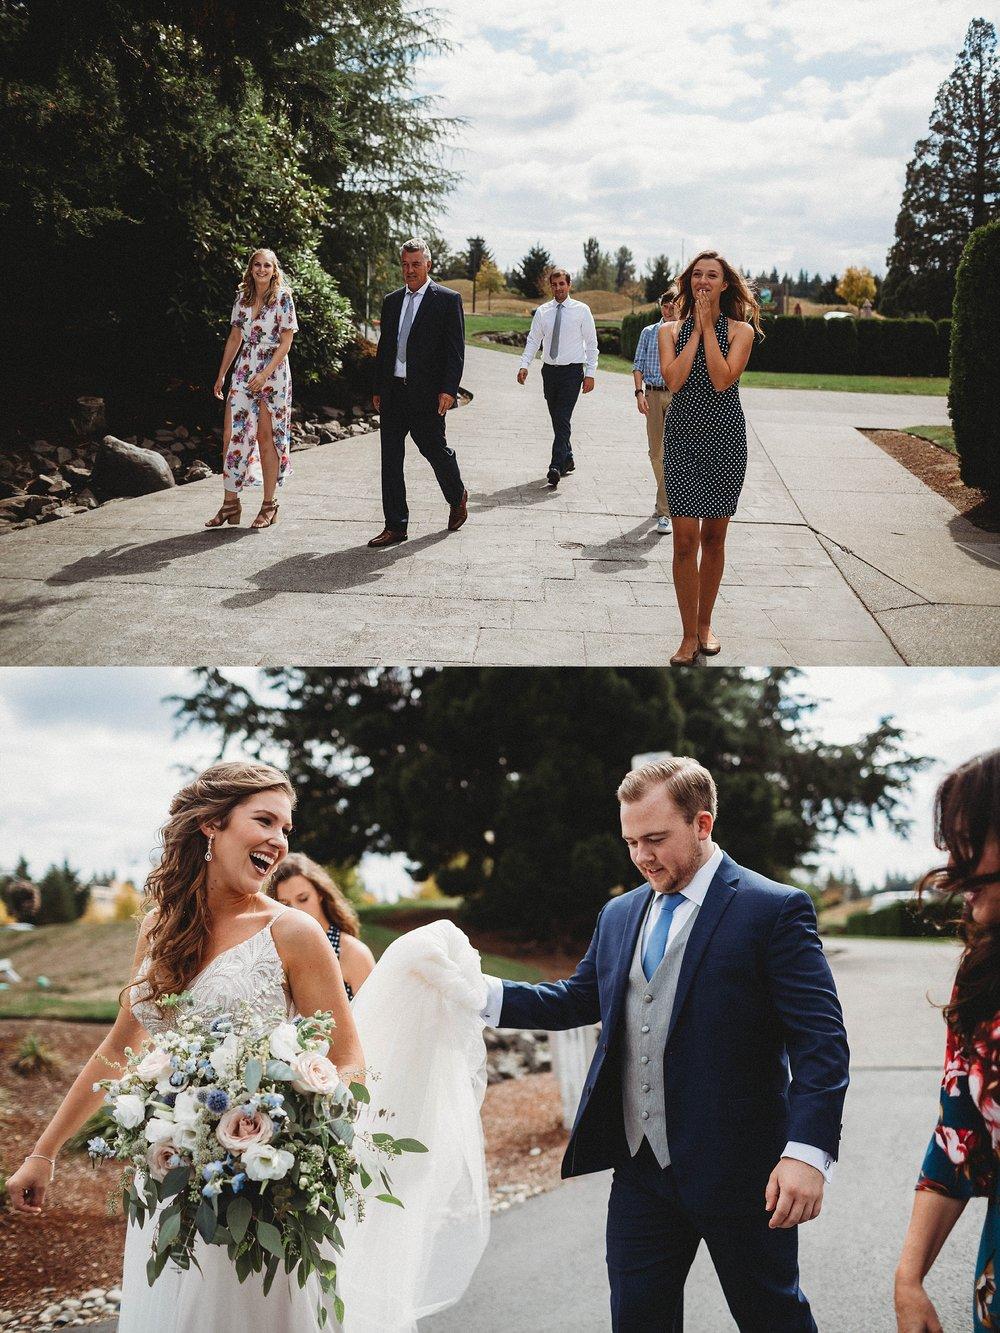 olson mansion wedding photography - jill and garrett - ashley vos photography - seattle area wedding photographer-25.jpg